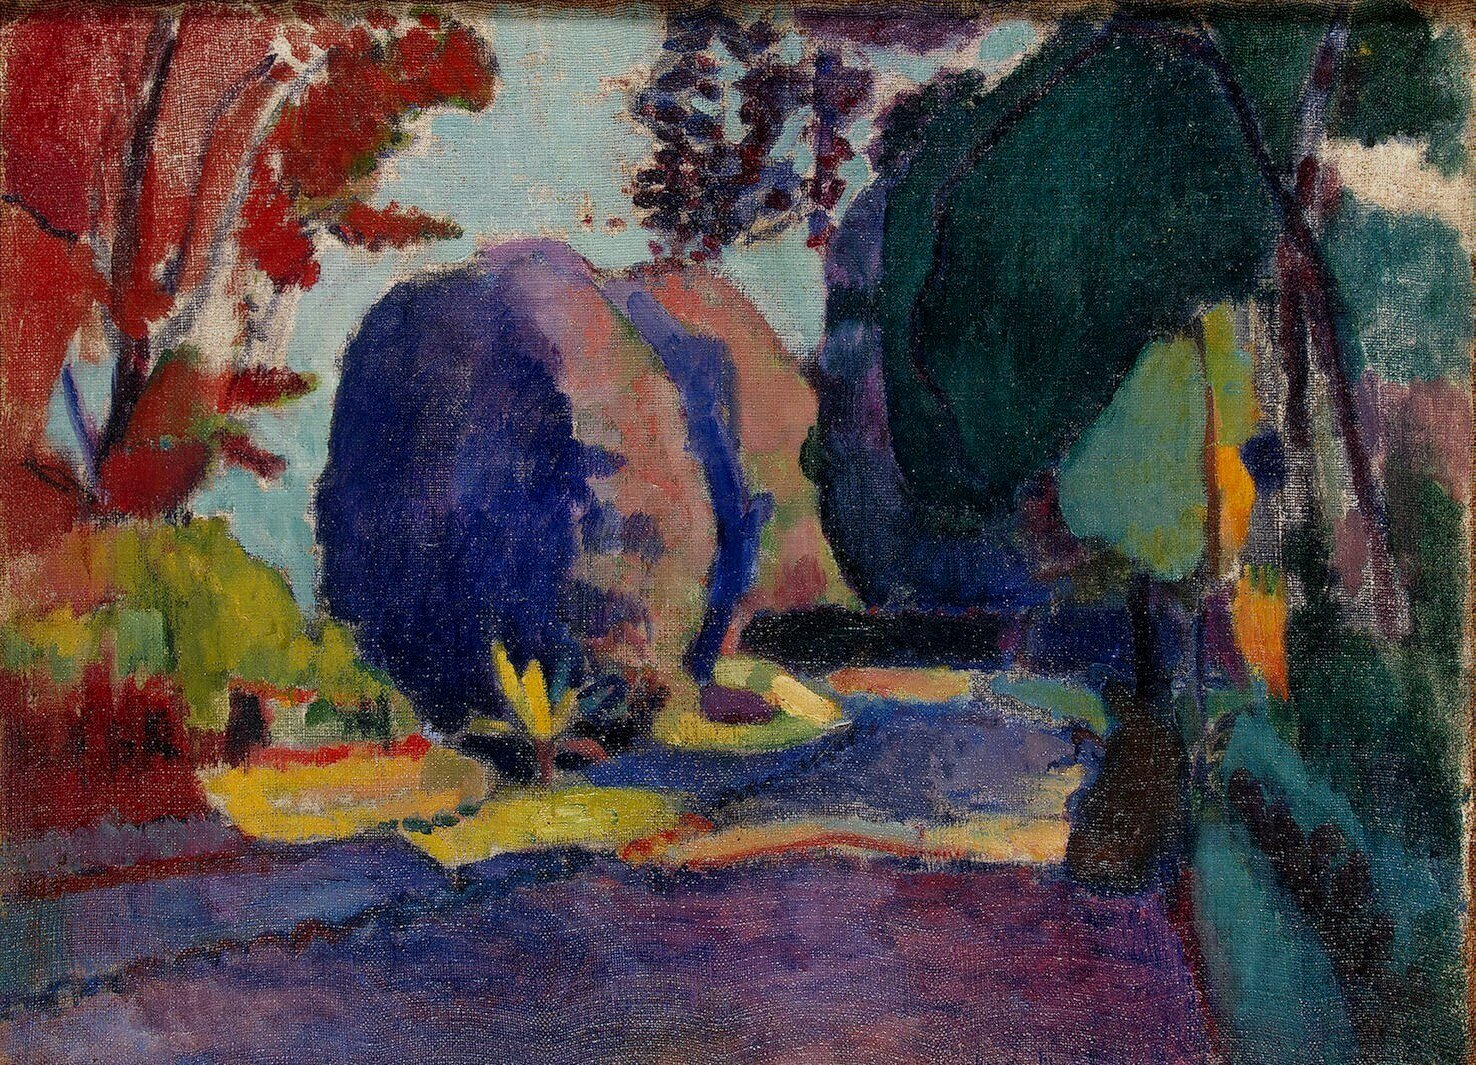 """Creativity takes courage"" - -Henri Matisse"